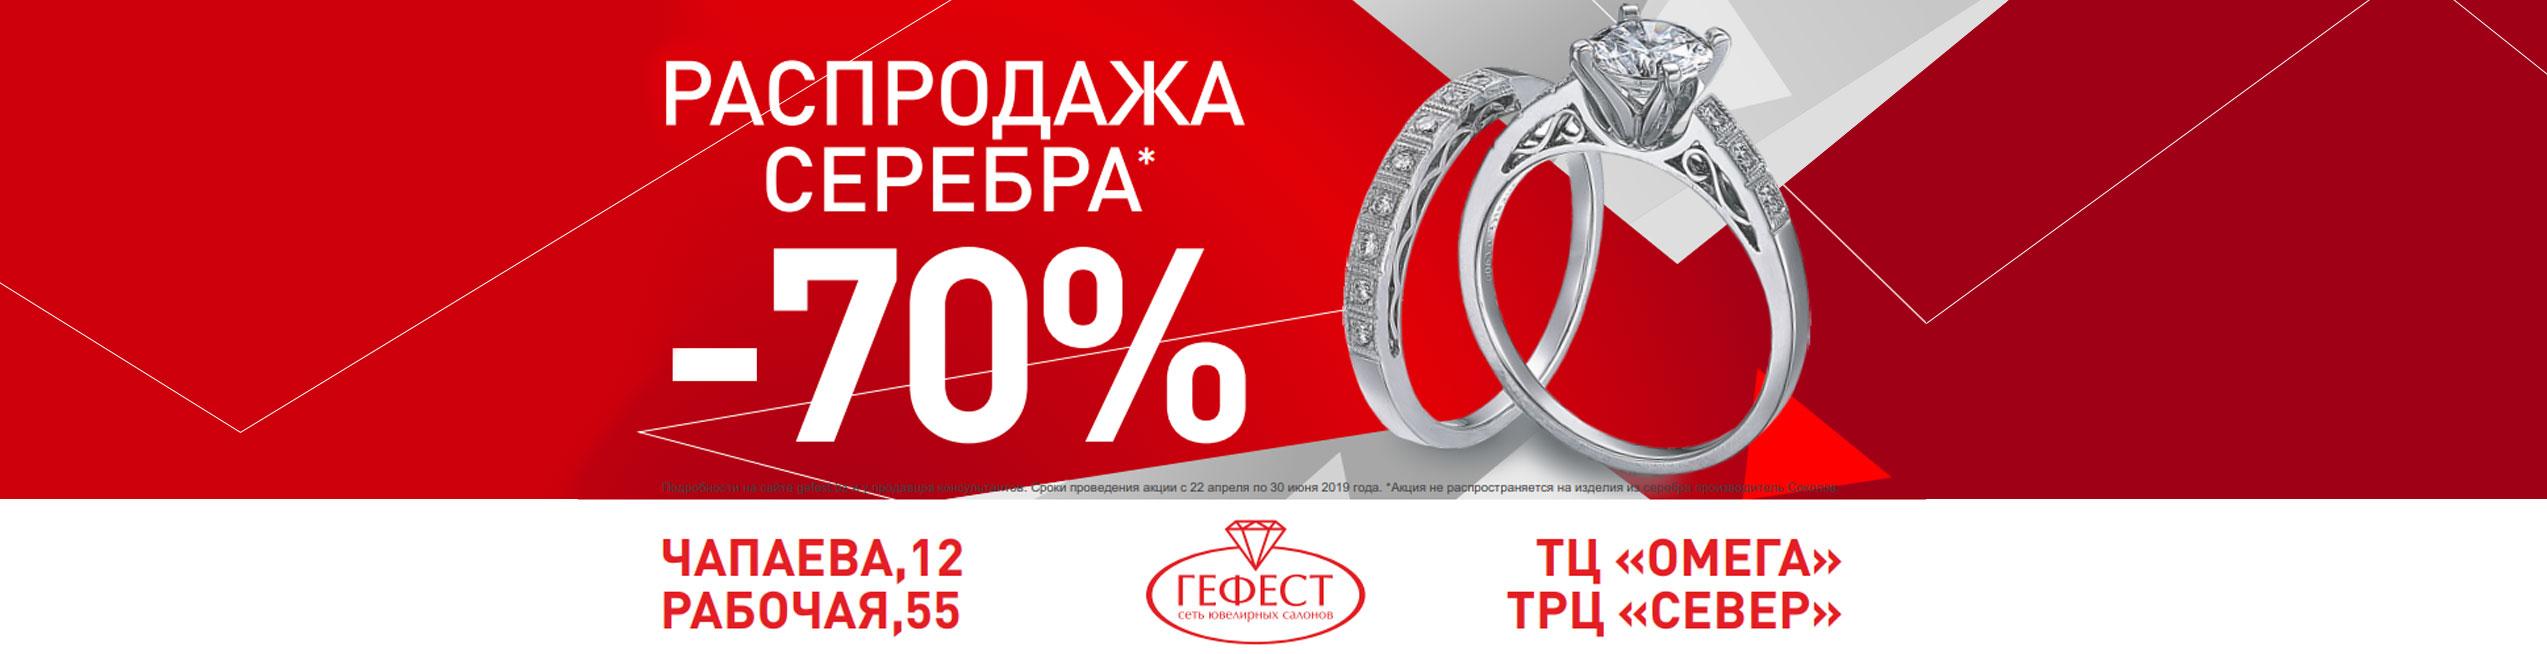 Распродажа серебра -70%